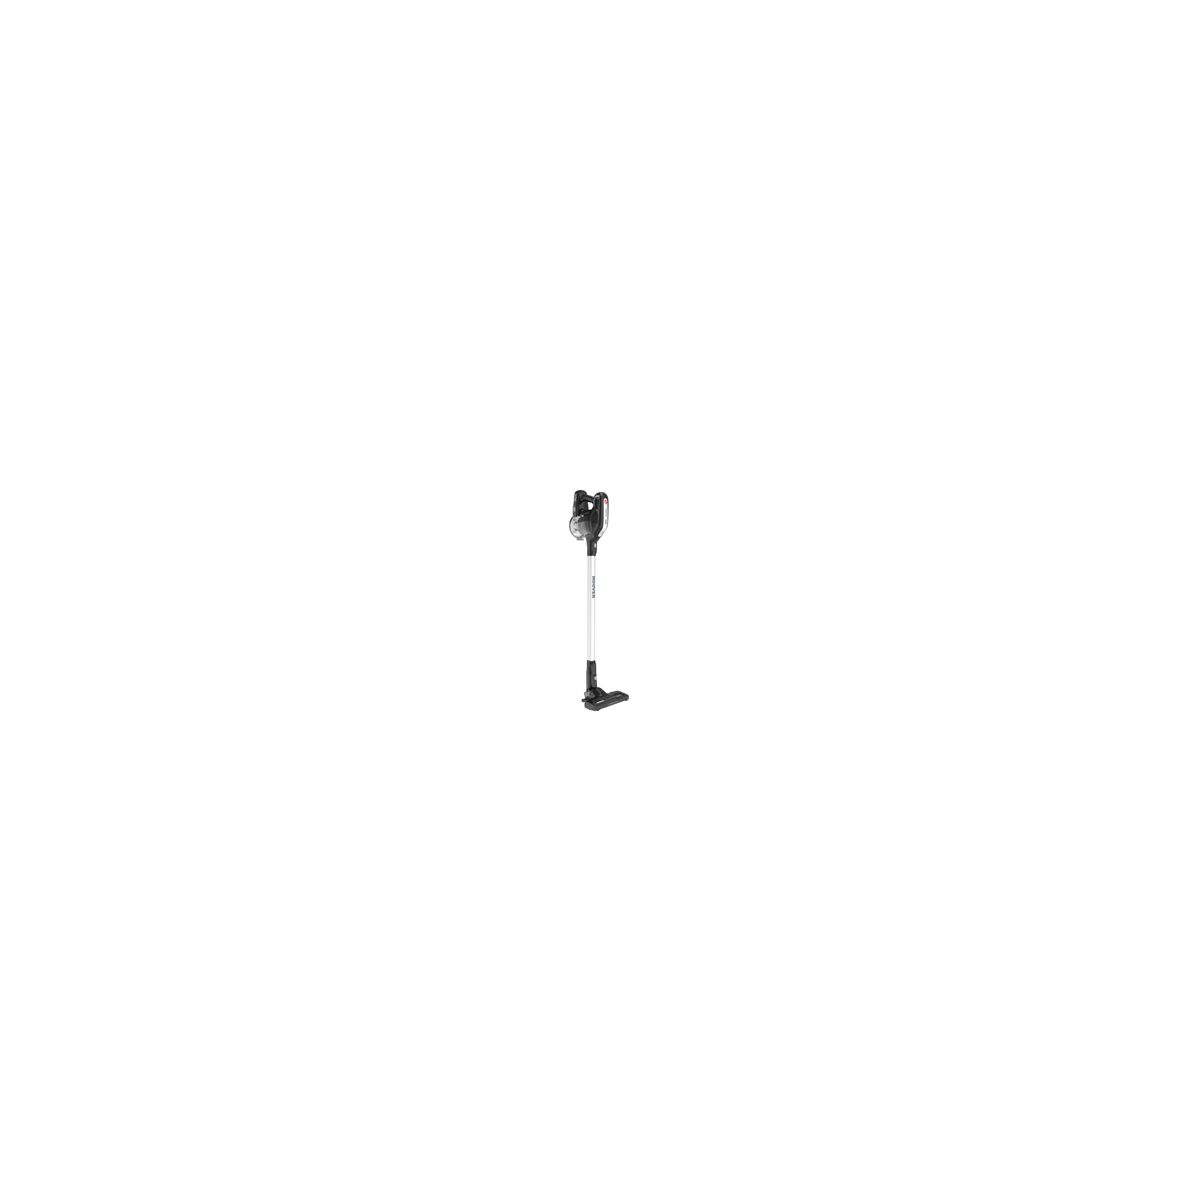 Aspirateur balai HOOVER Multi-fonctions HF18GH H-FREE